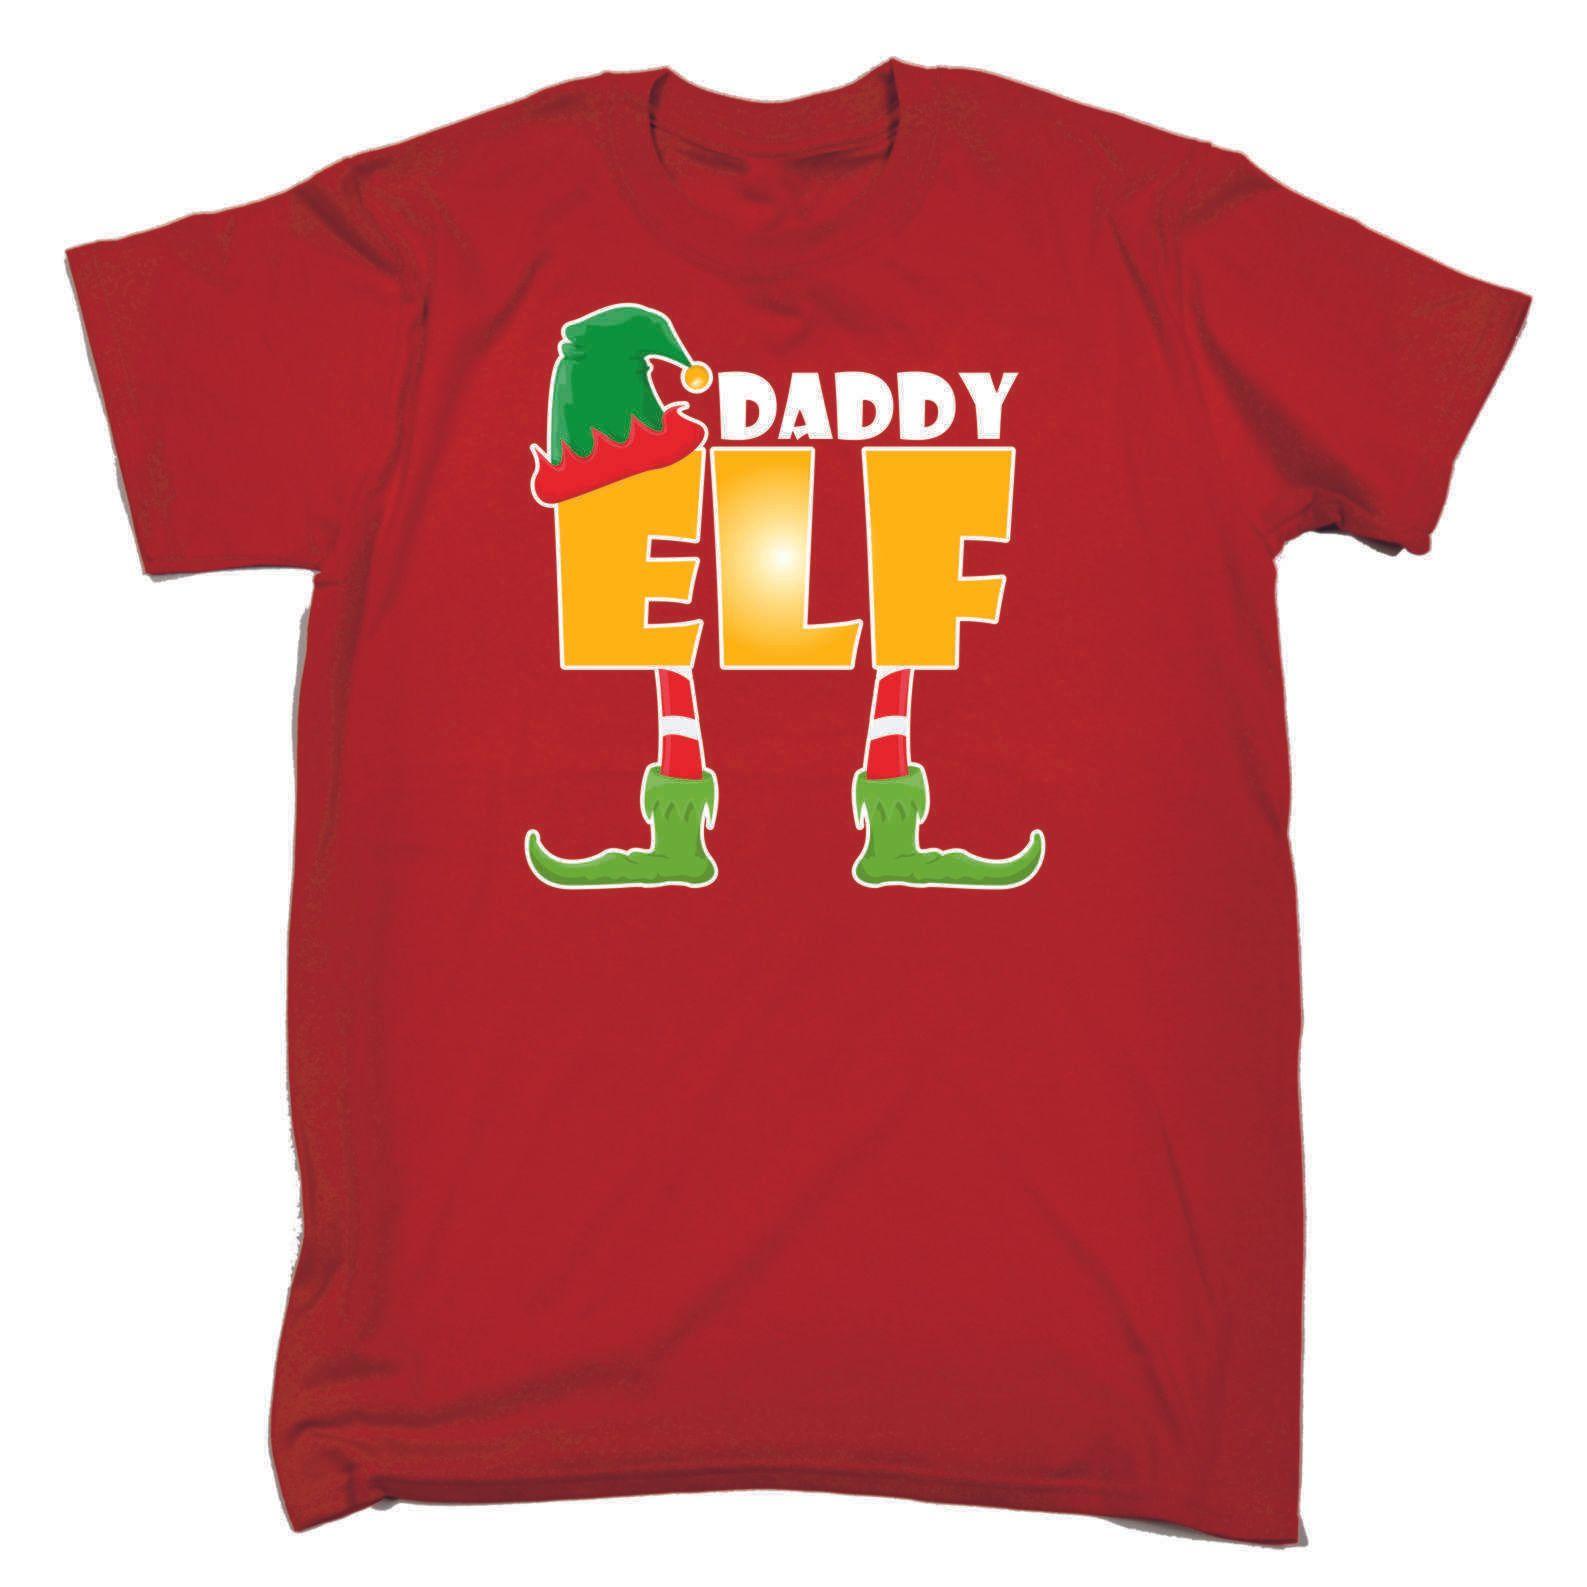 fd9757fbc2 ELF Family Christmas T Shirts Novelty Funny X Mas Day Red Loose Fit T Shirt  Og T Shirt T Shrt From Notkillape, $11.01| DHgate.Com